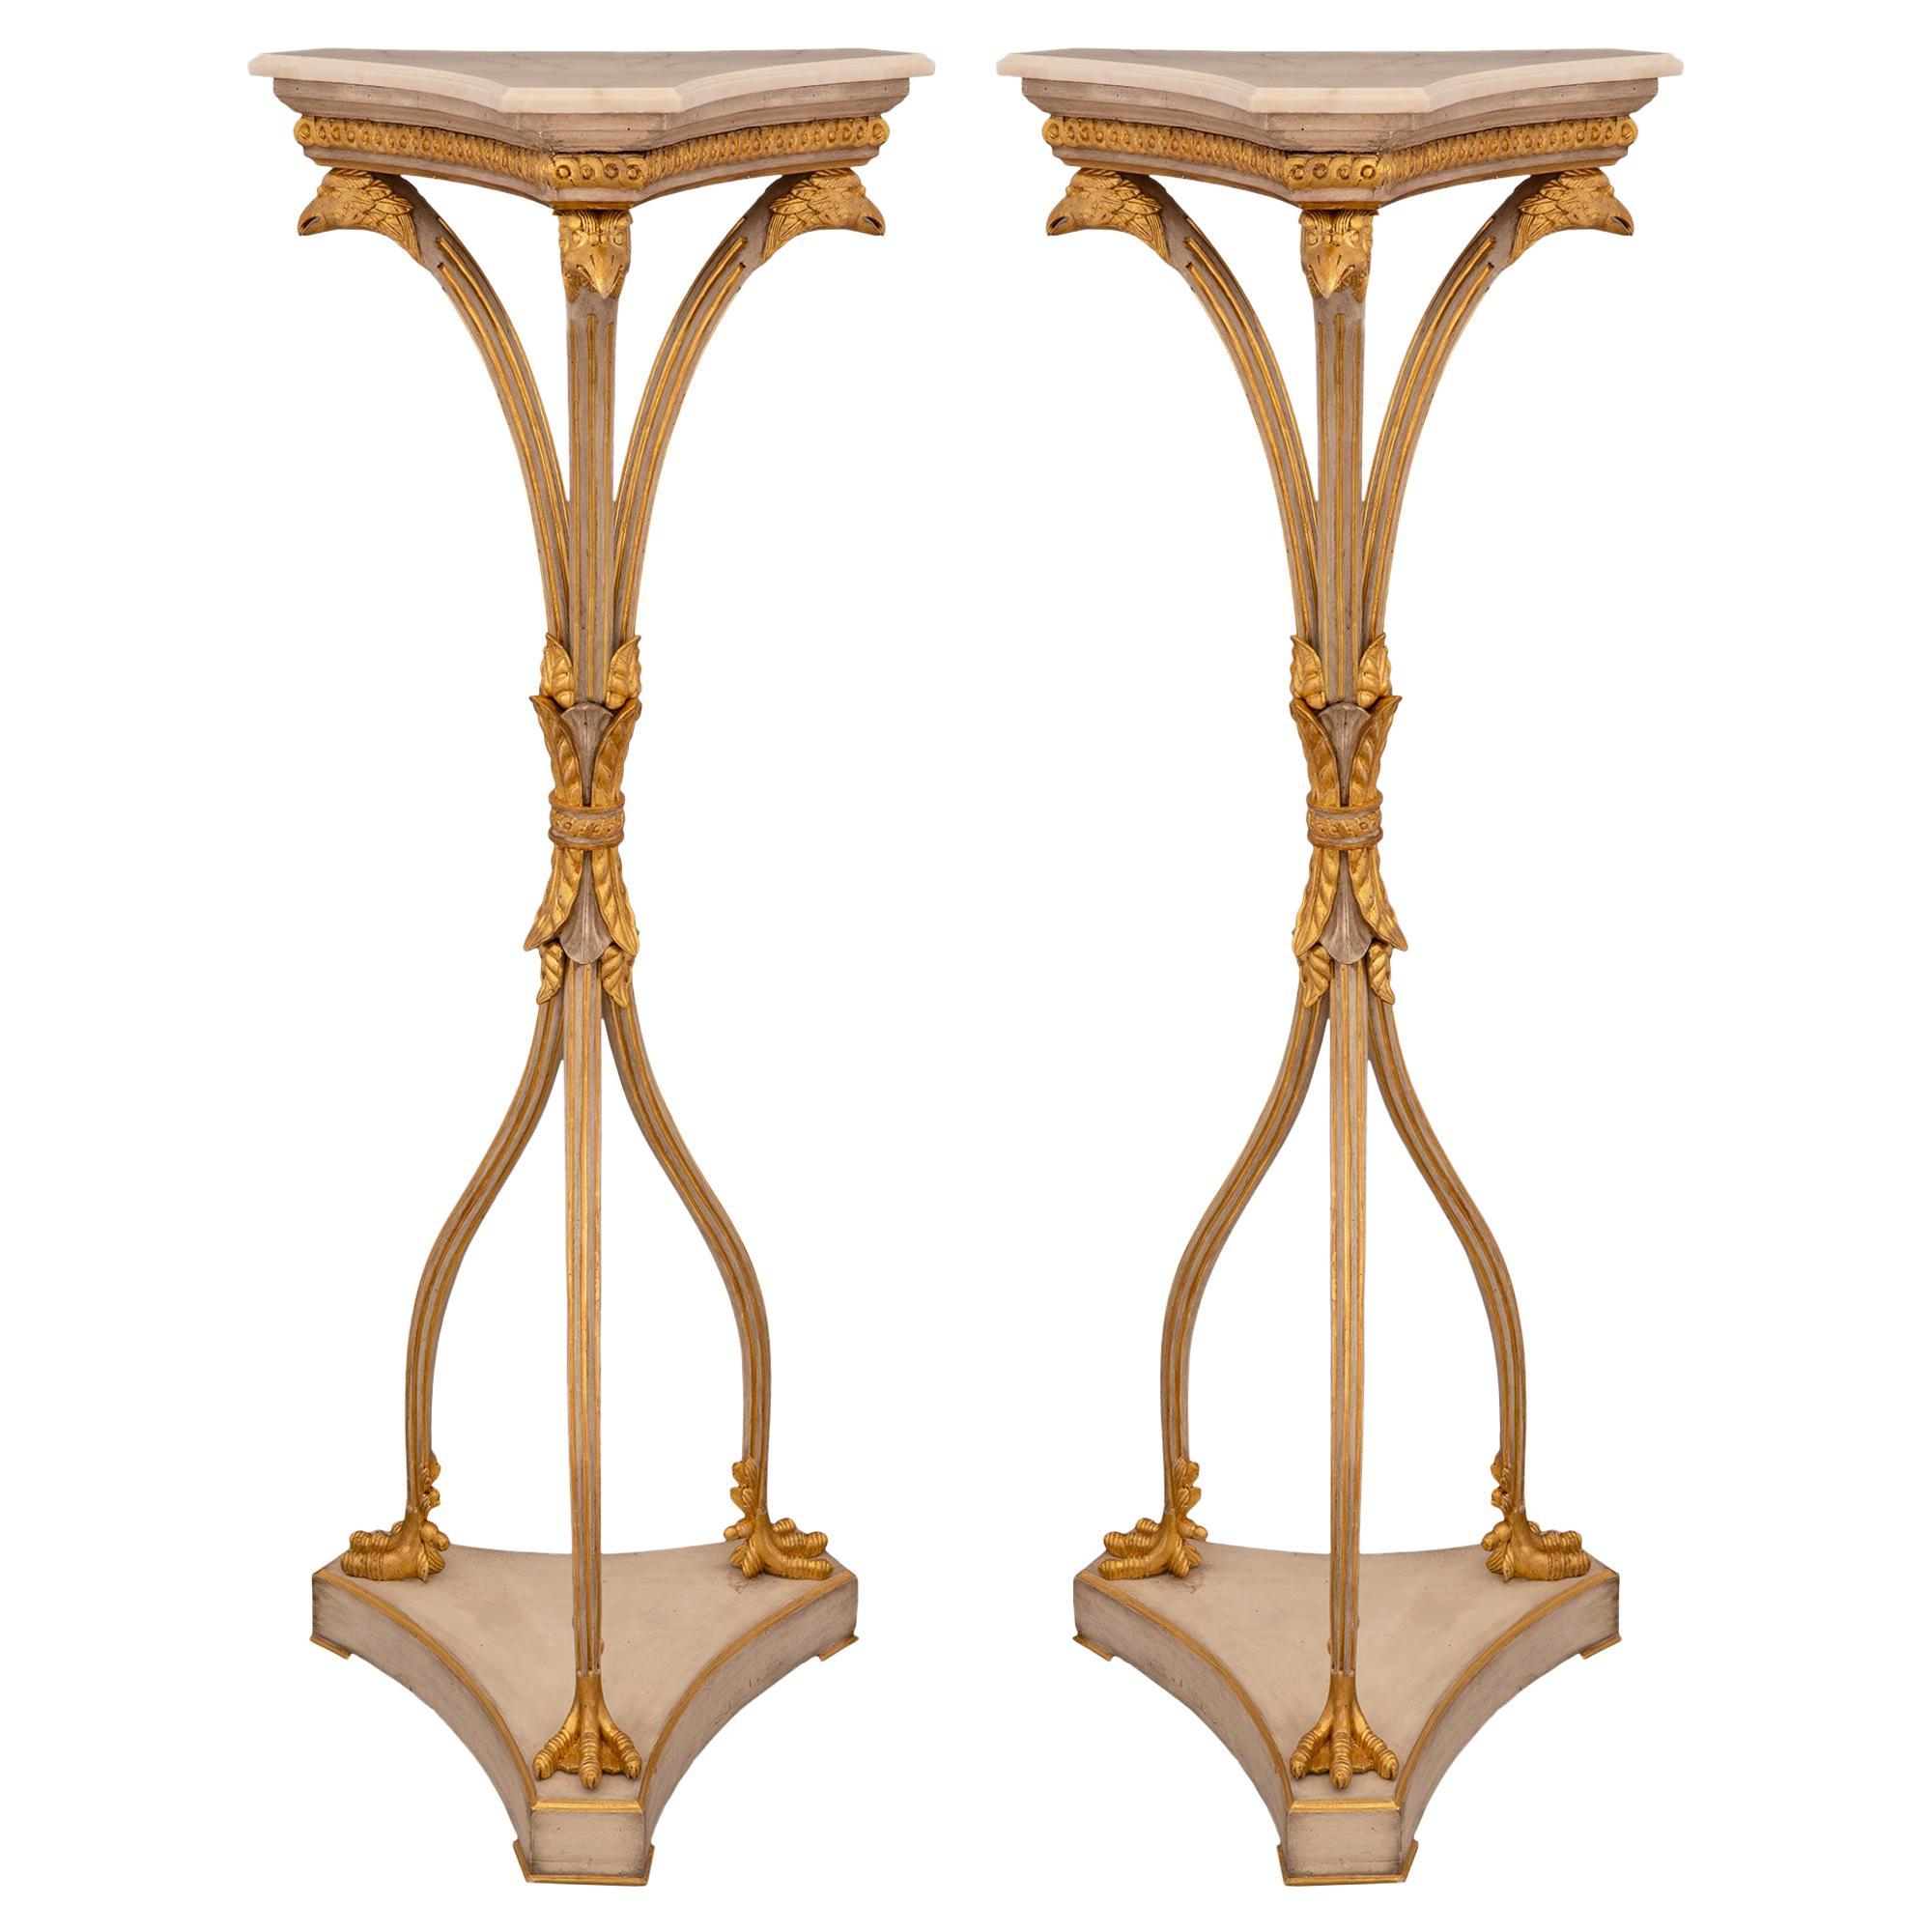 Pair of Italian 19th Century Neoclassical Style Pedestals